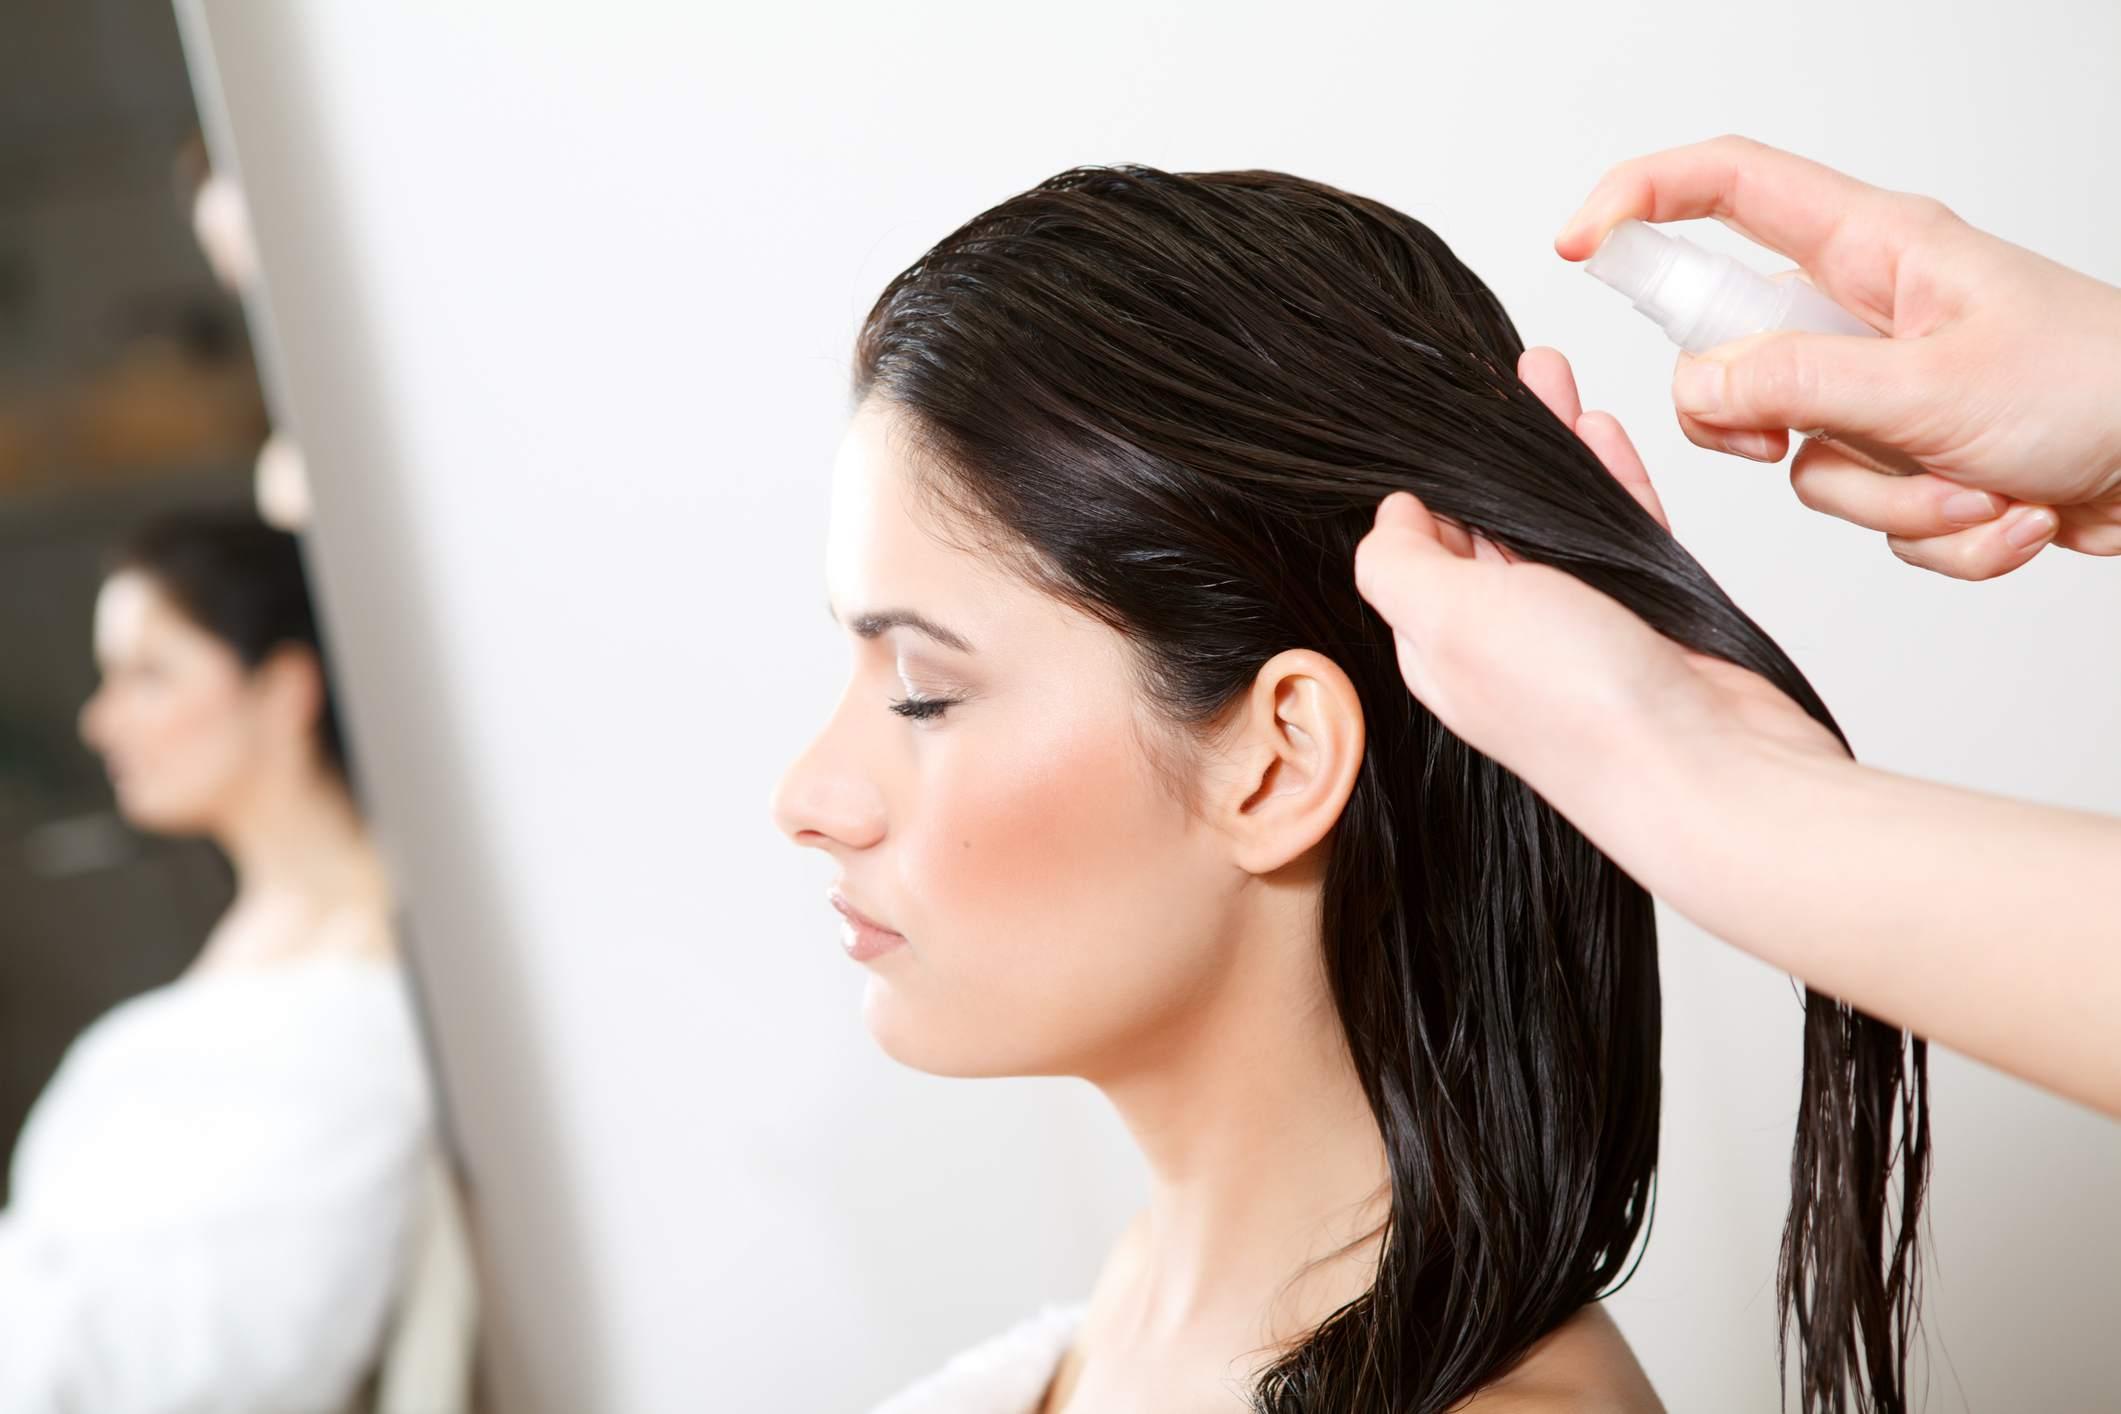 woman getting hair oil sprayed in her hair